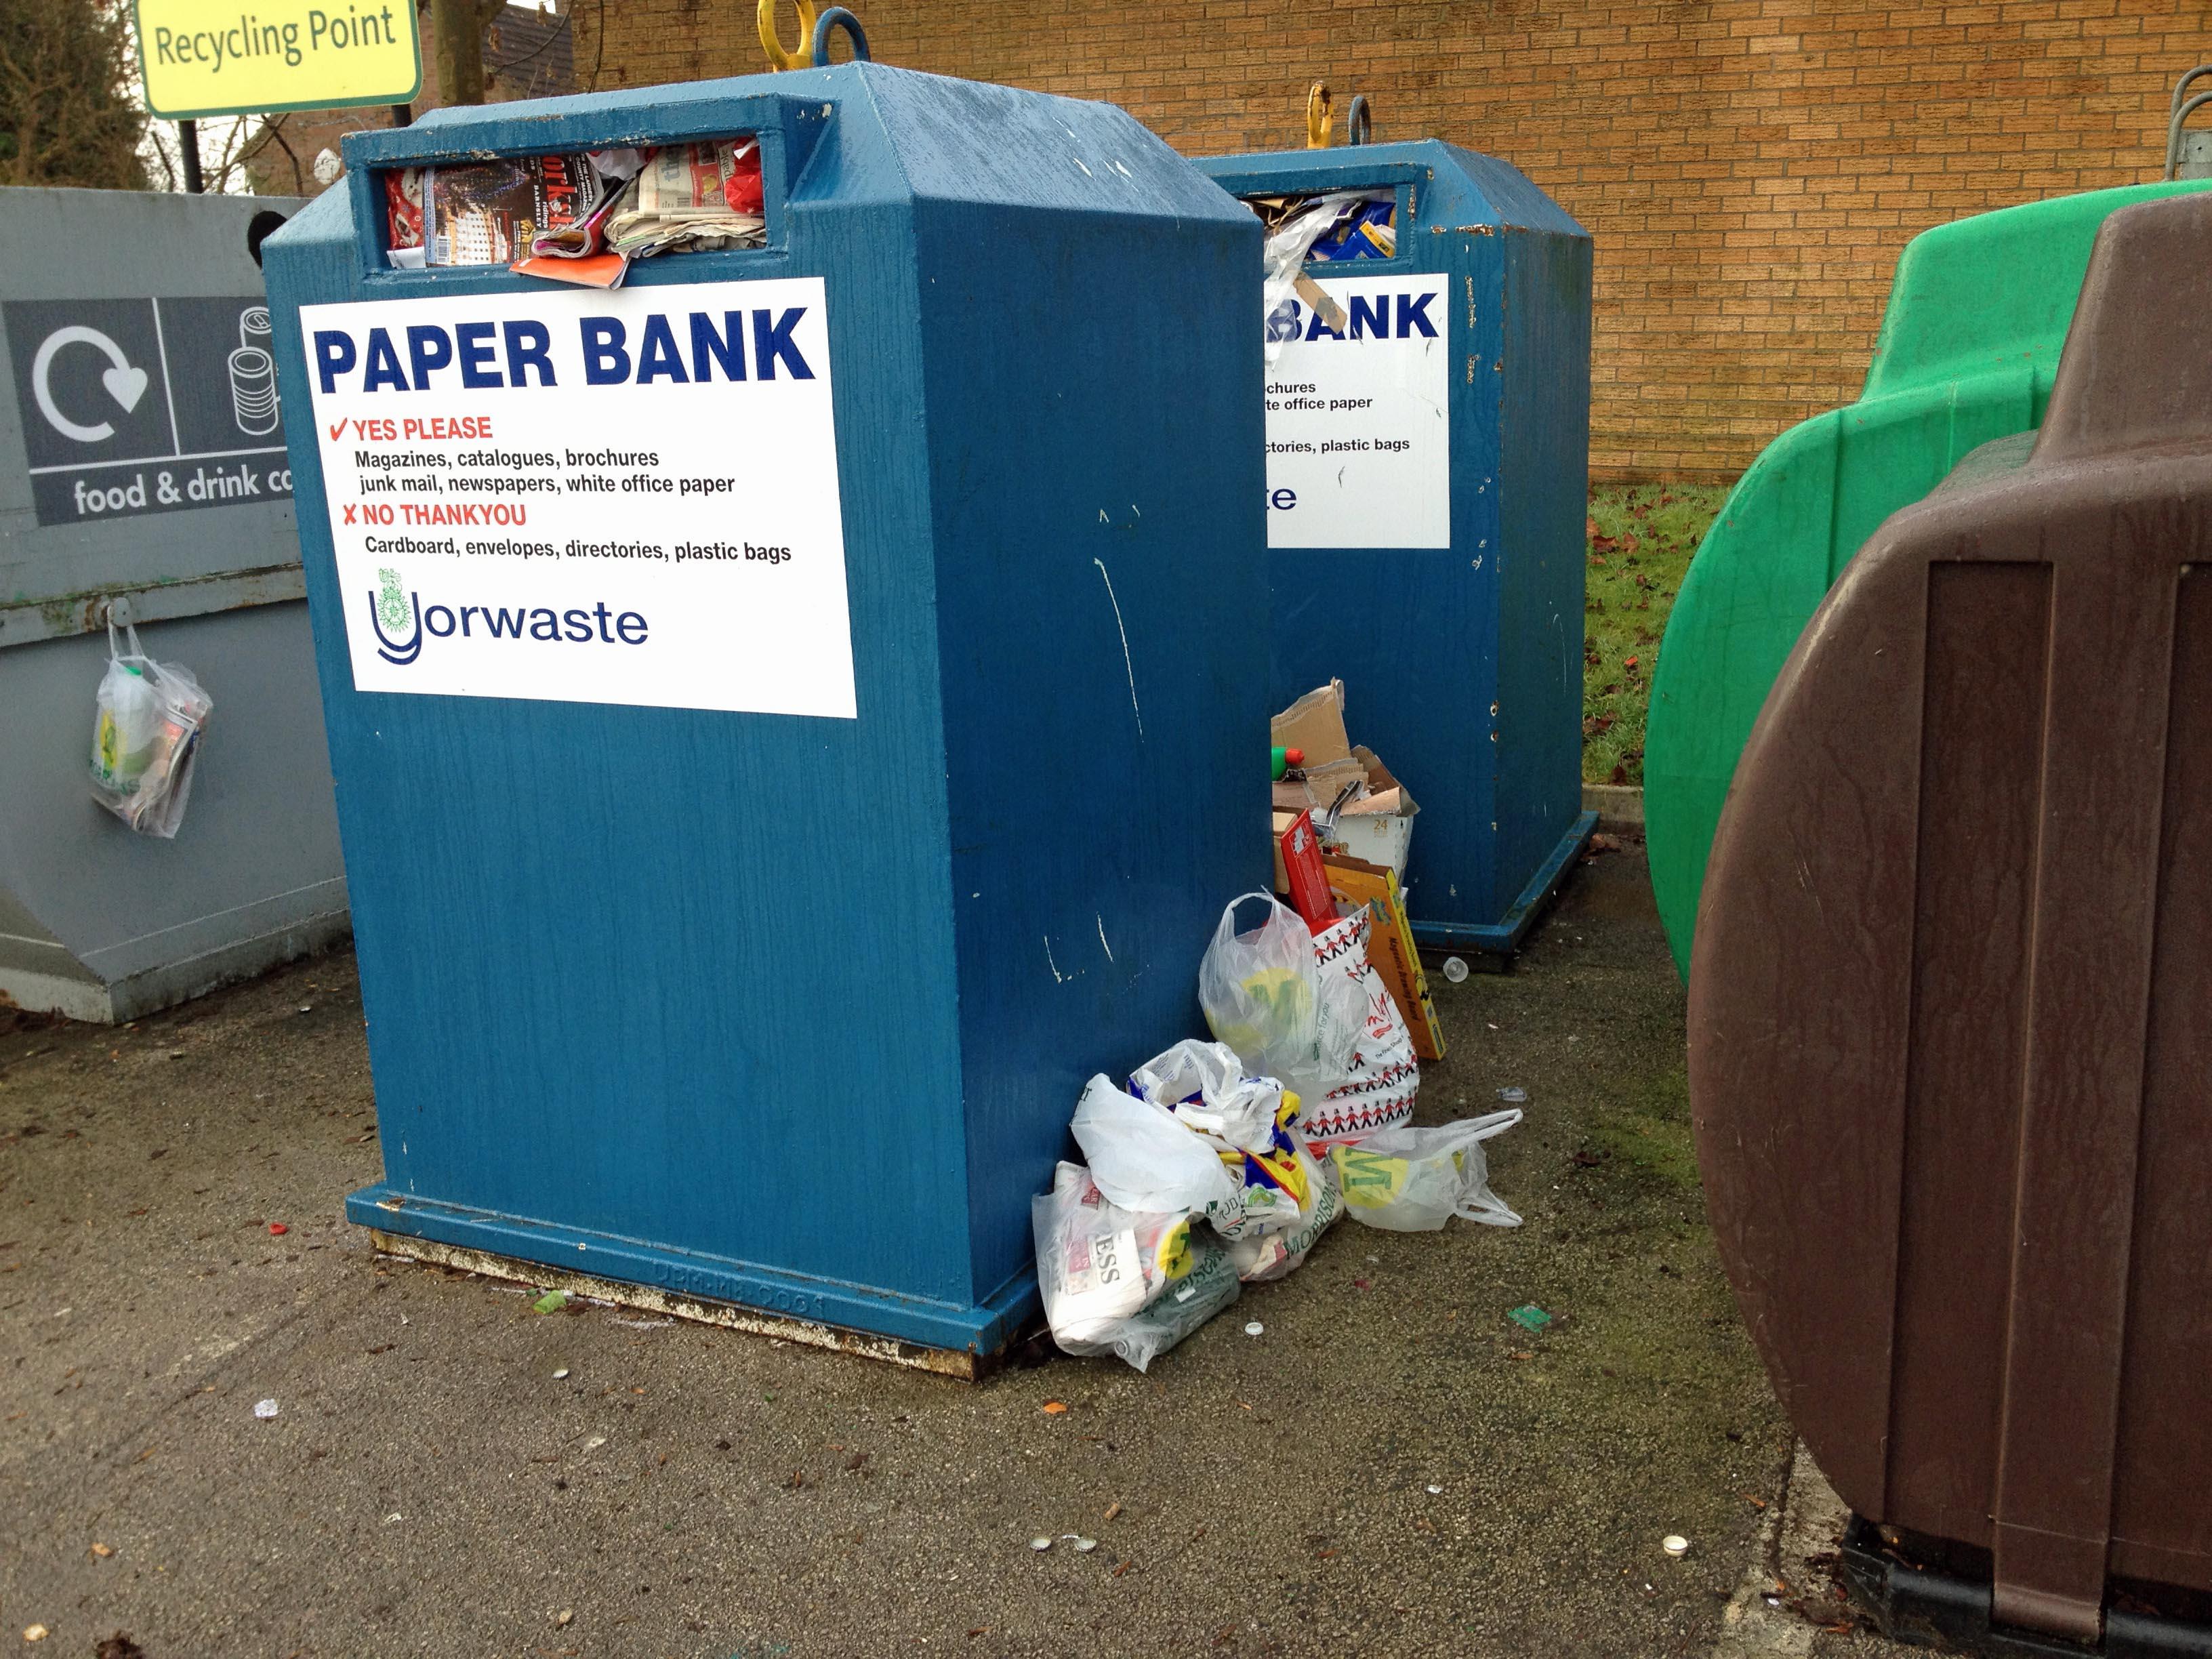 Paper bank